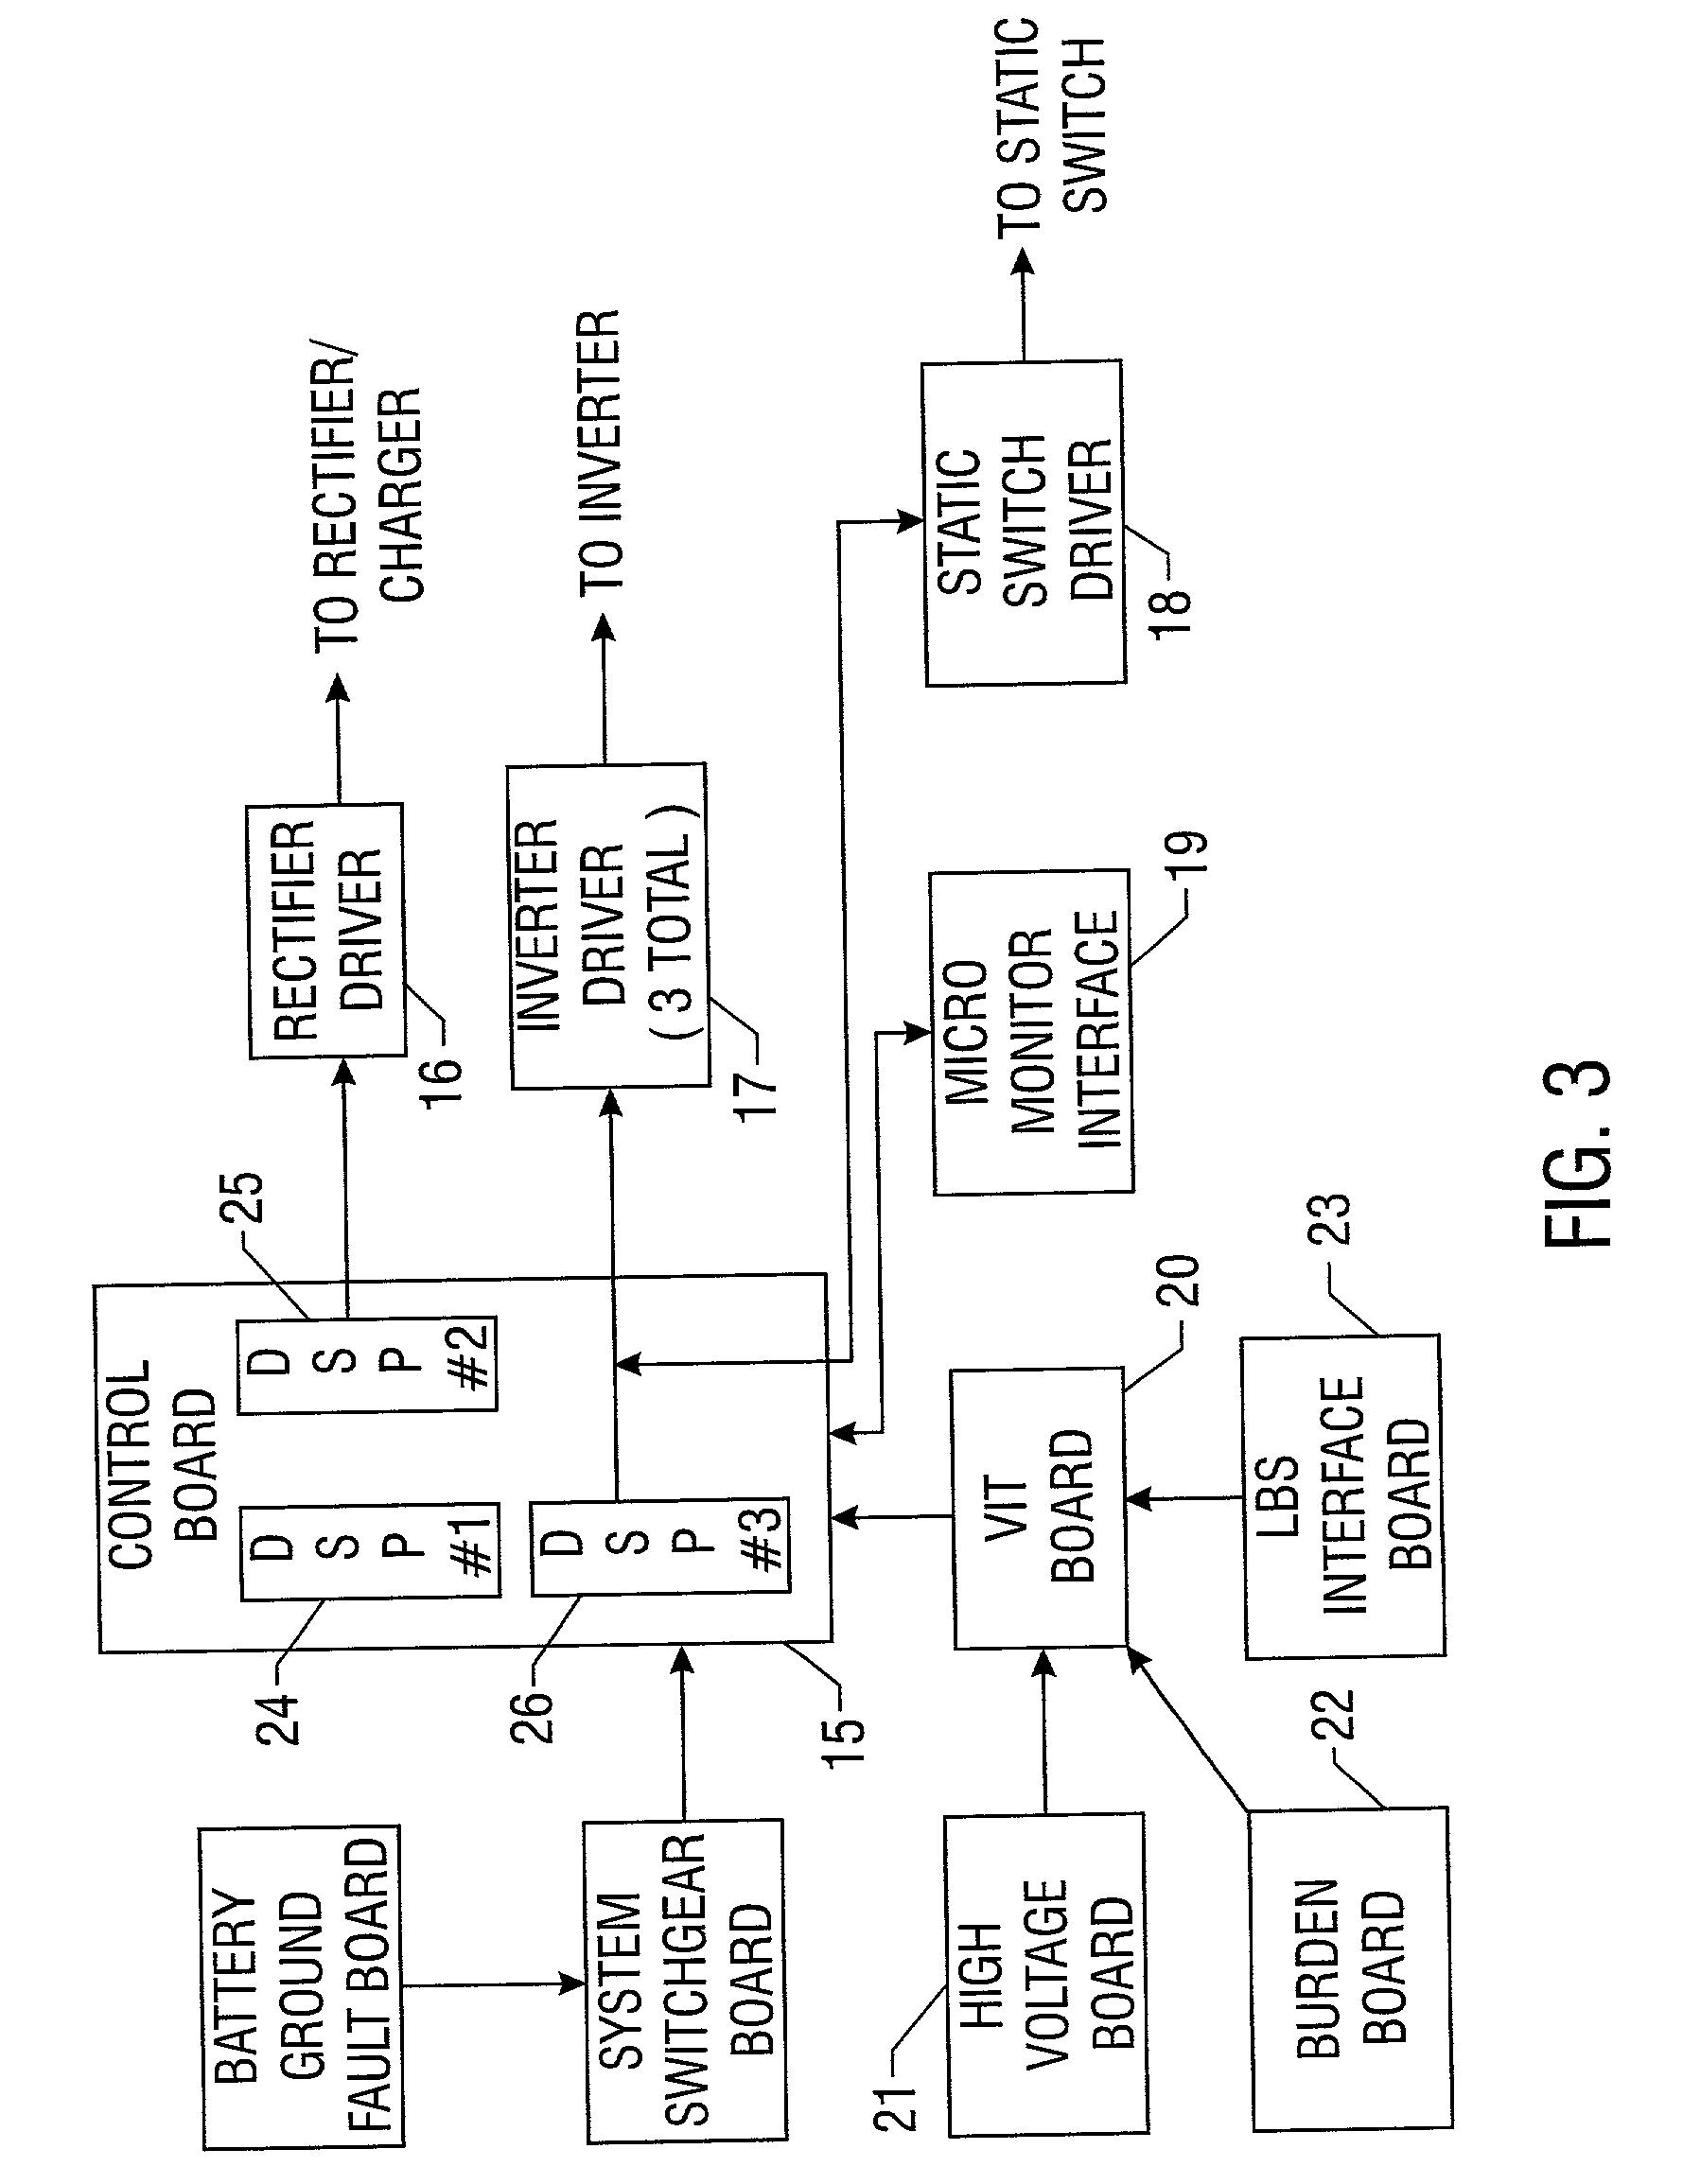 Apc Battery Backup Wiring Diagram